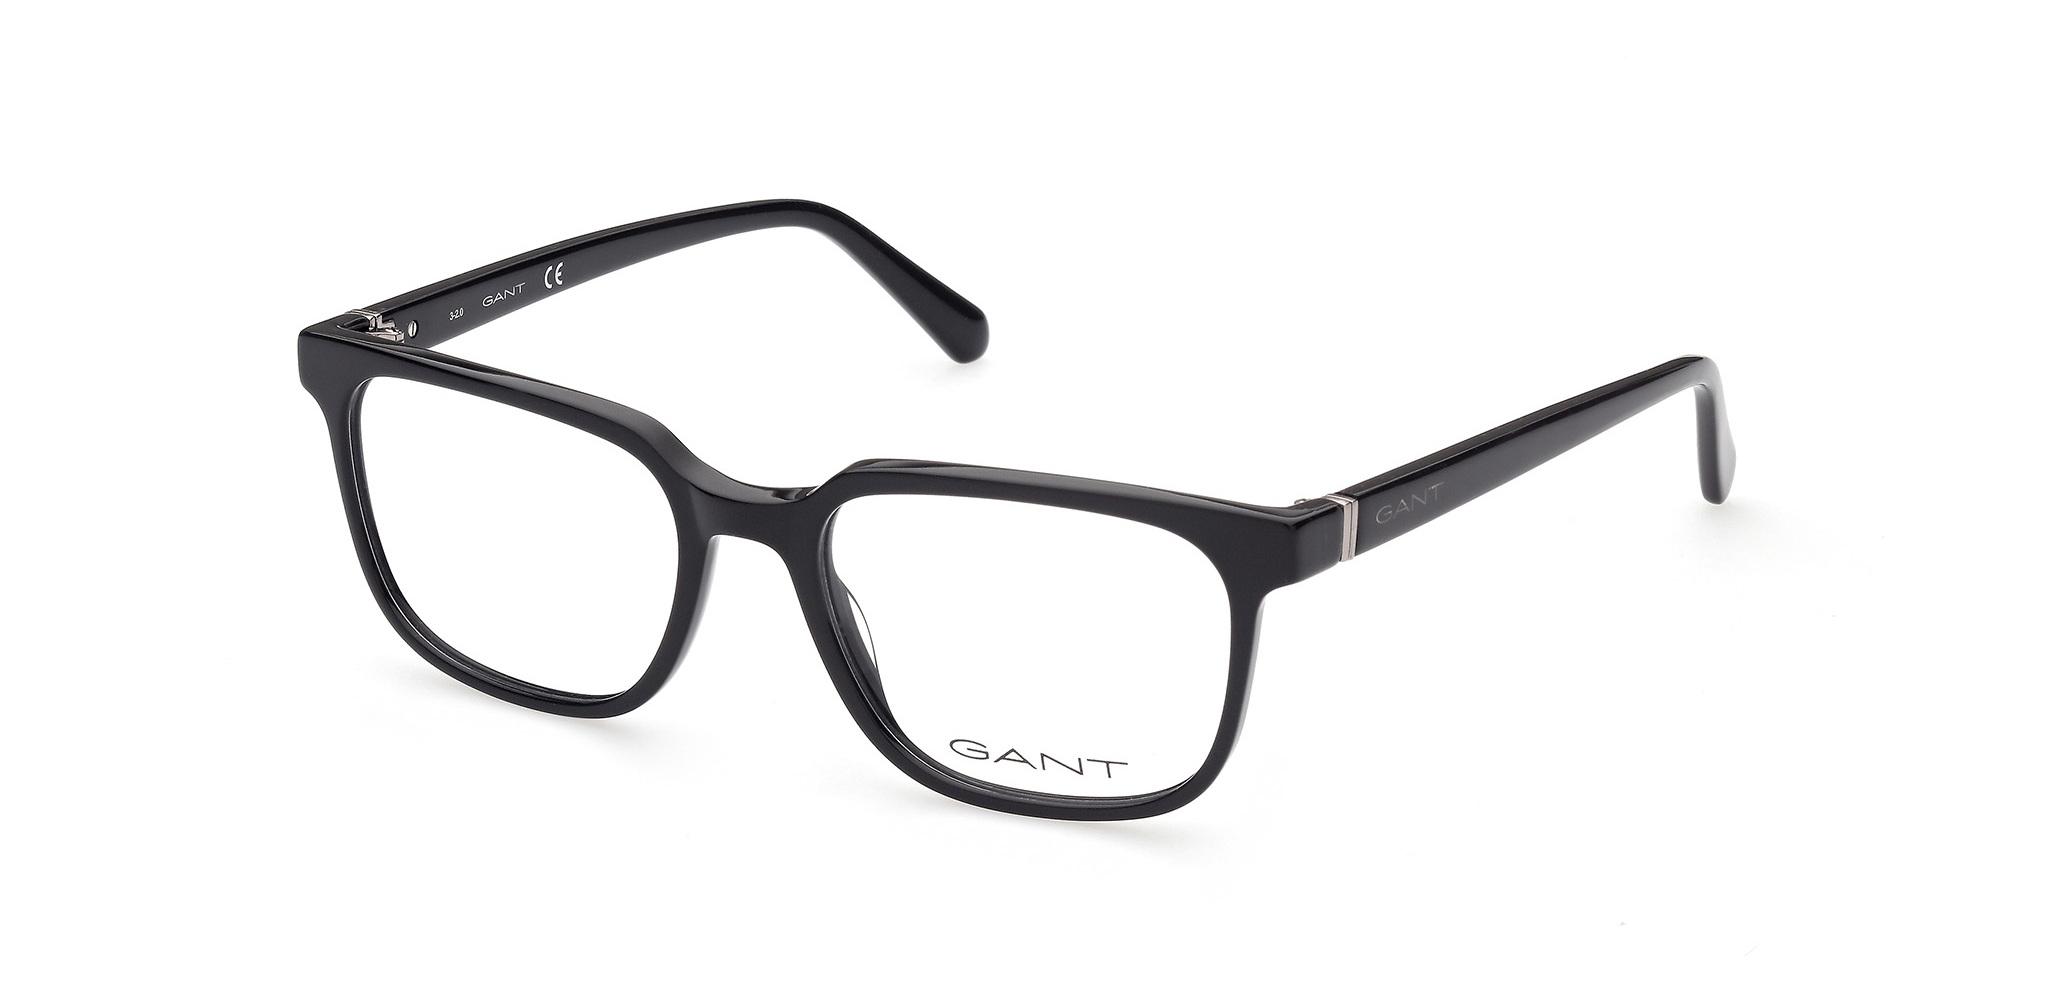 Gant Ga3244